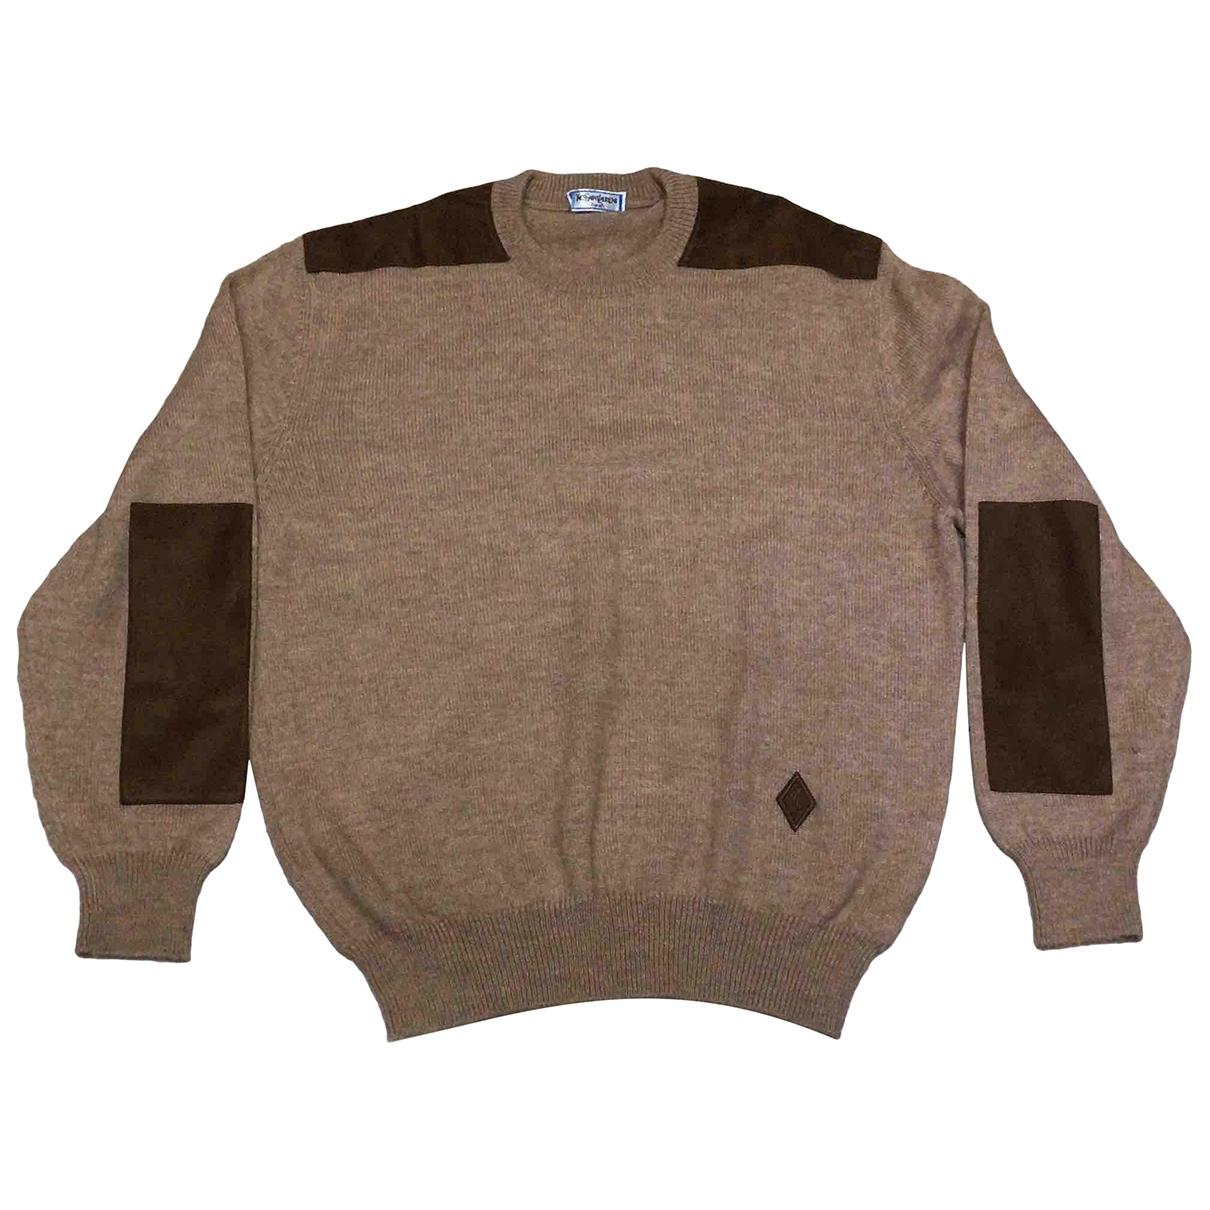 Yves Saint Laurent \N Beige Wool Knitwear & Sweatshirts for Men 5 0 - 6